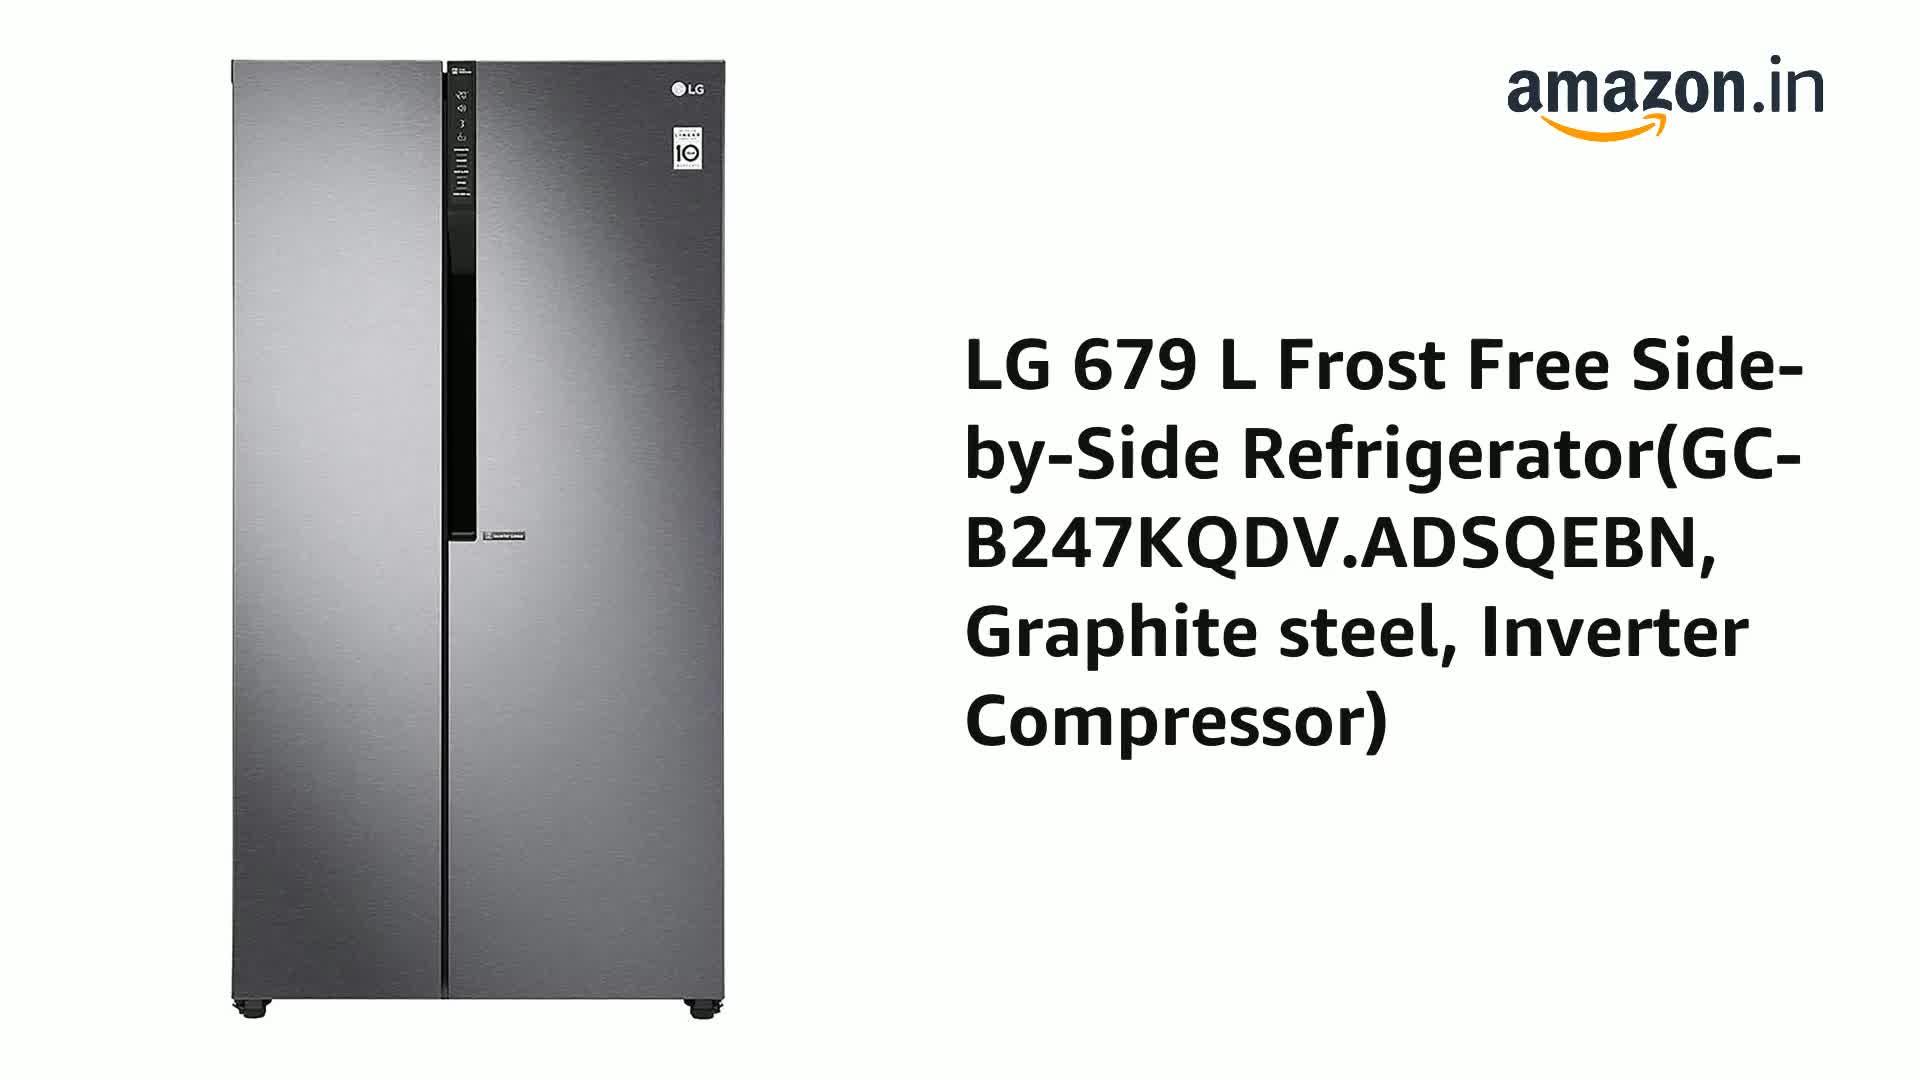 Lg 679 L Frost Free Side By Side Refrigerator Gc B247kqdv Adsqebn Graphite Steel Inverter Compressor Amazon In Home Kitchen